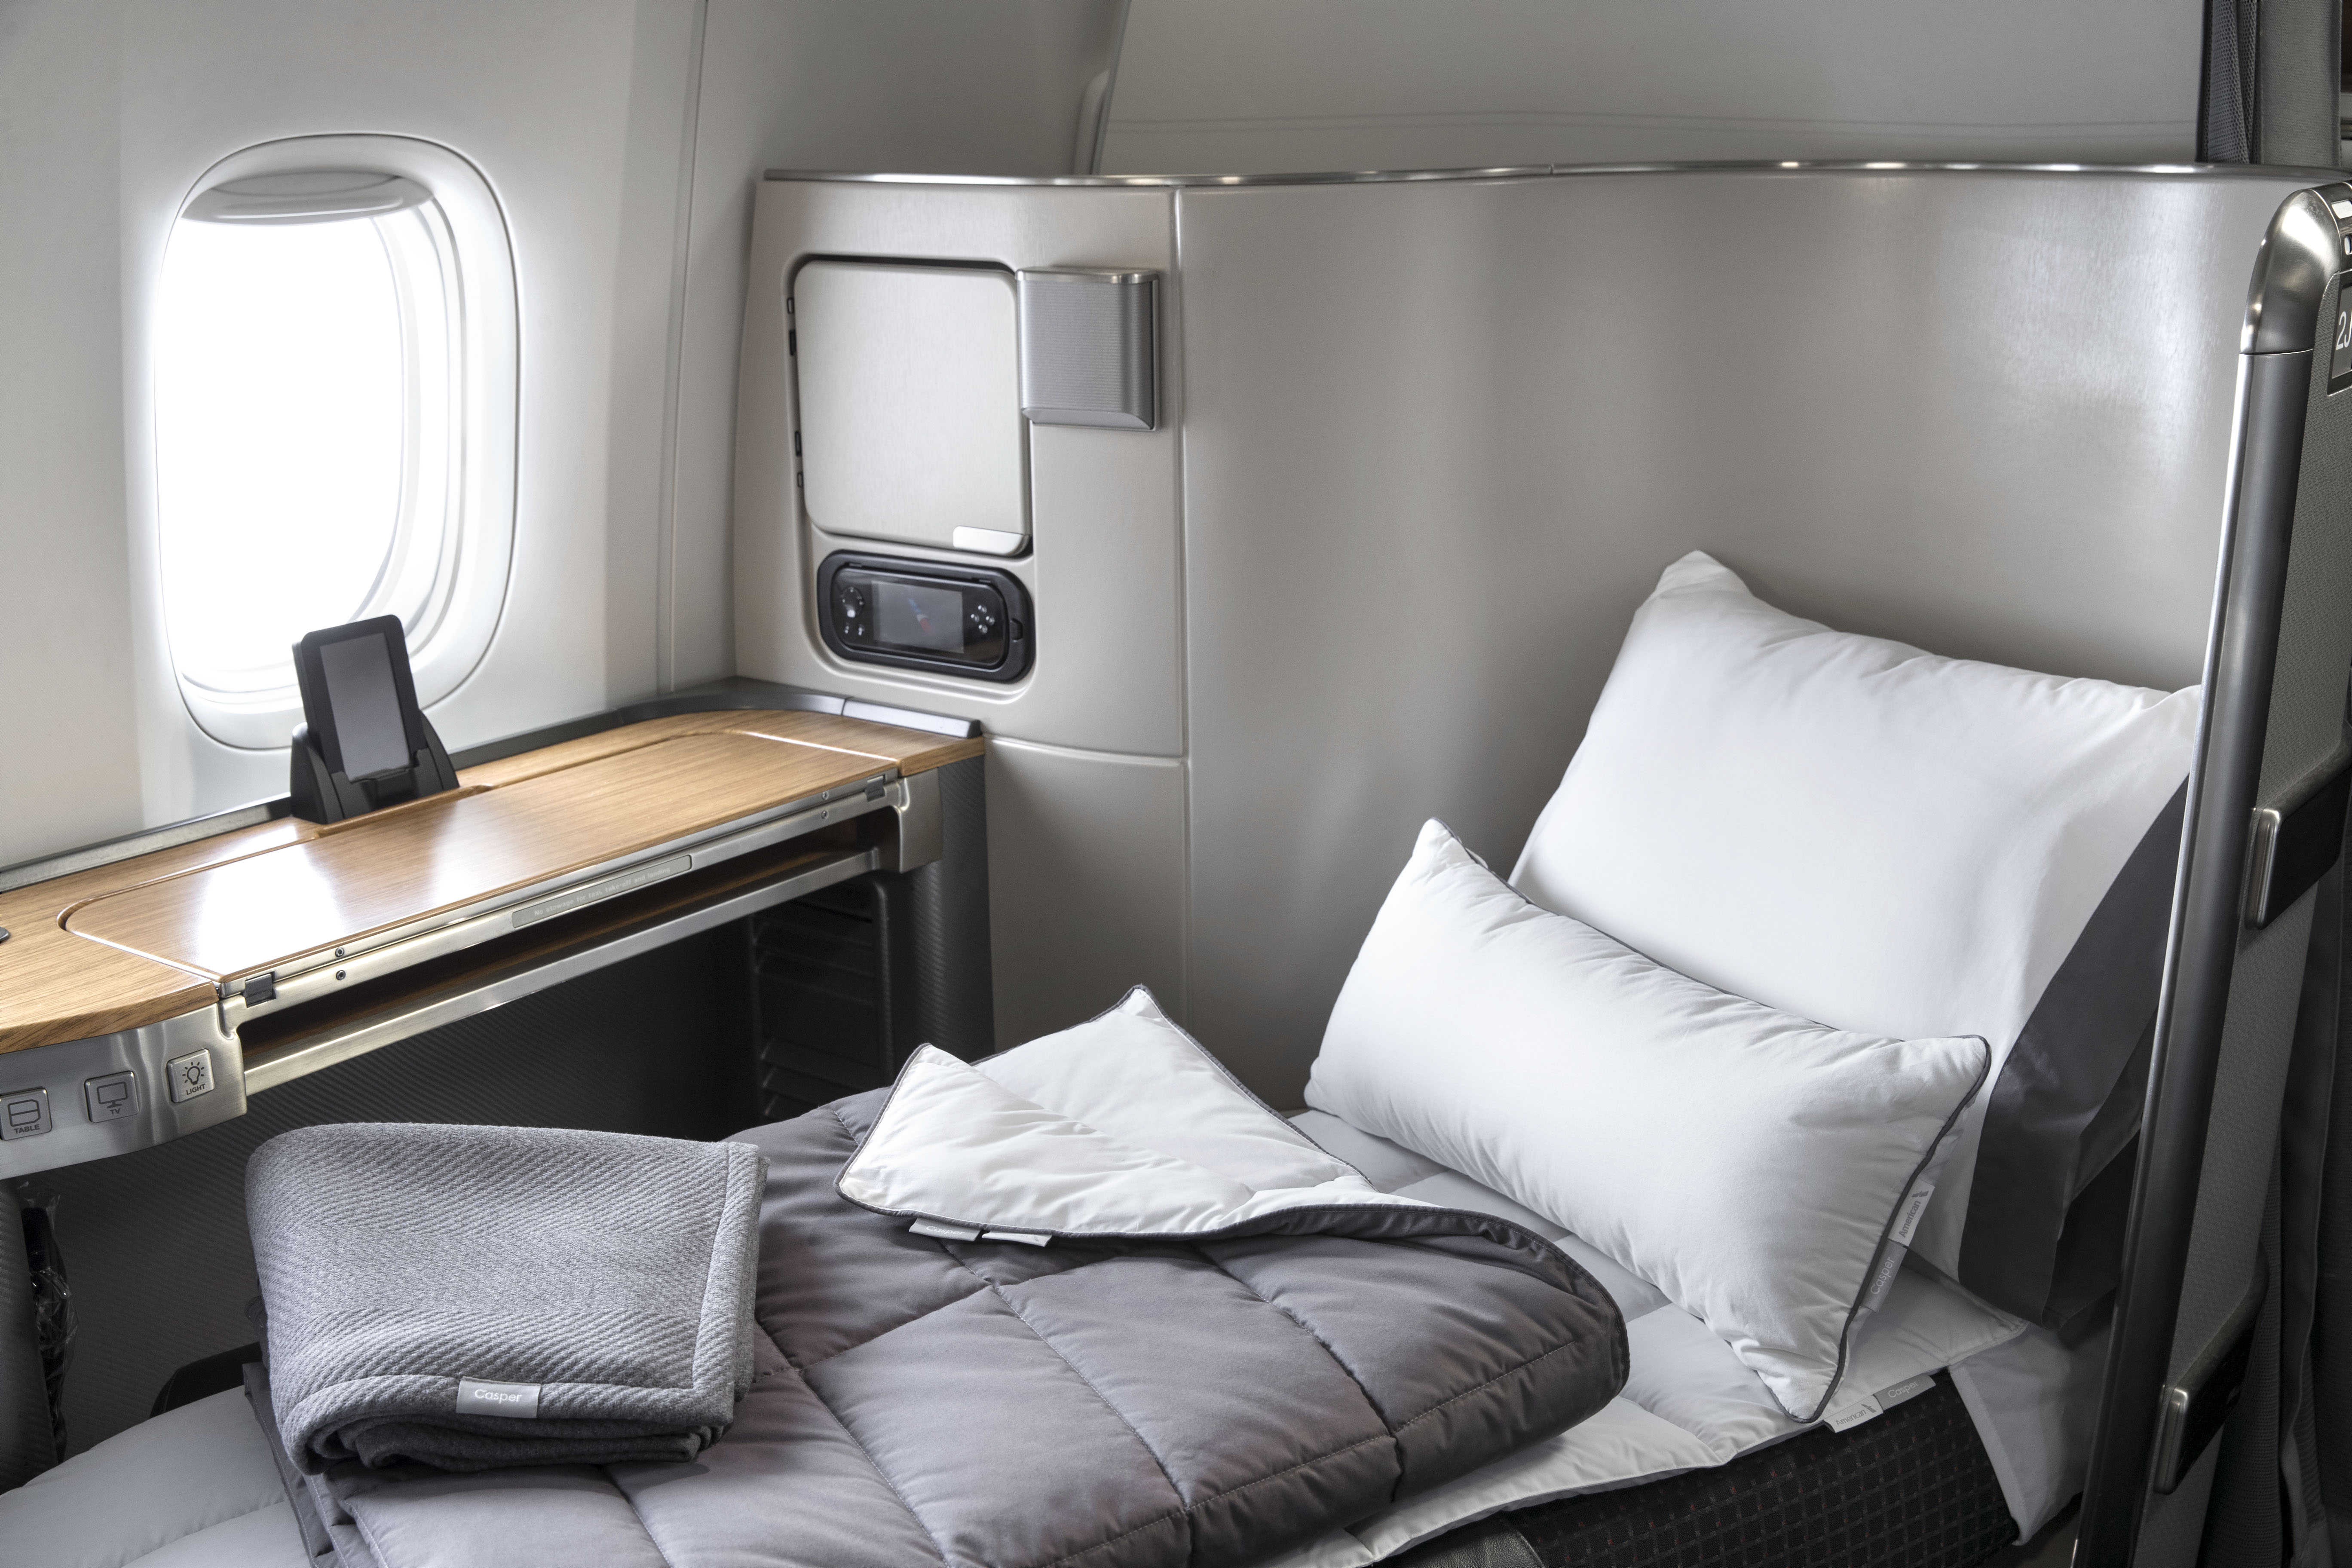 American Airlines Casper bedding